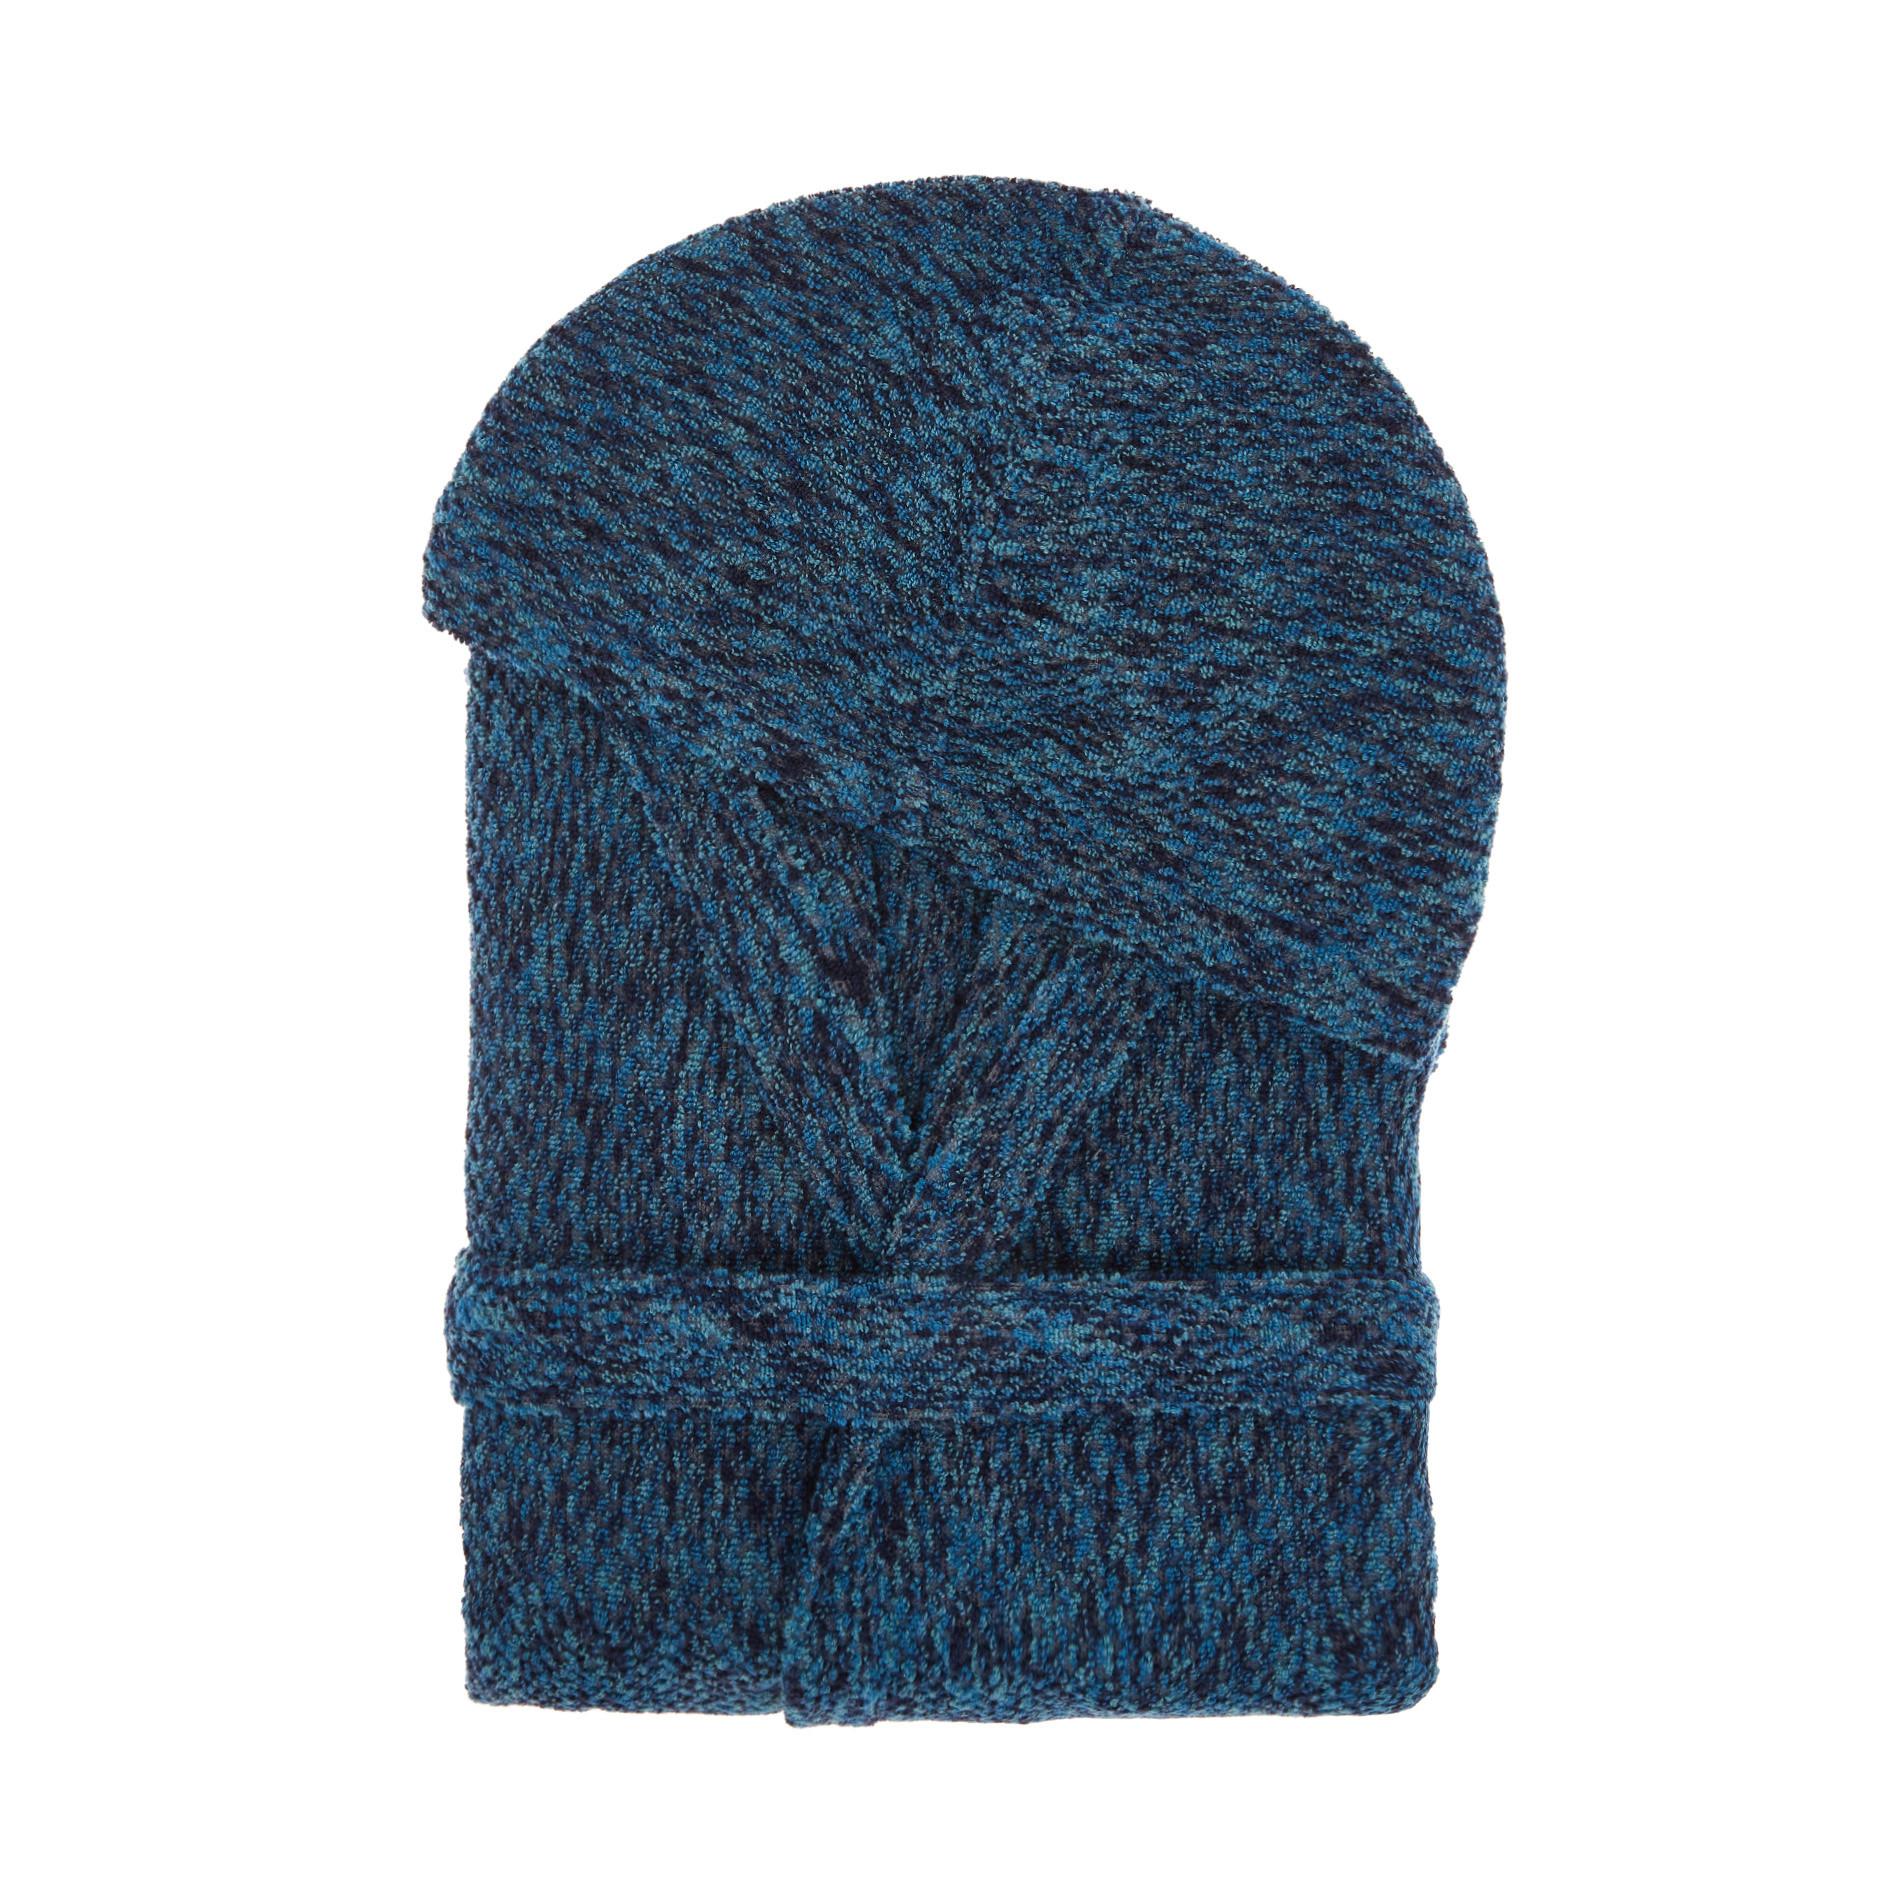 Accappatoio spugna di cotone effetto melange, Blu, large image number 0